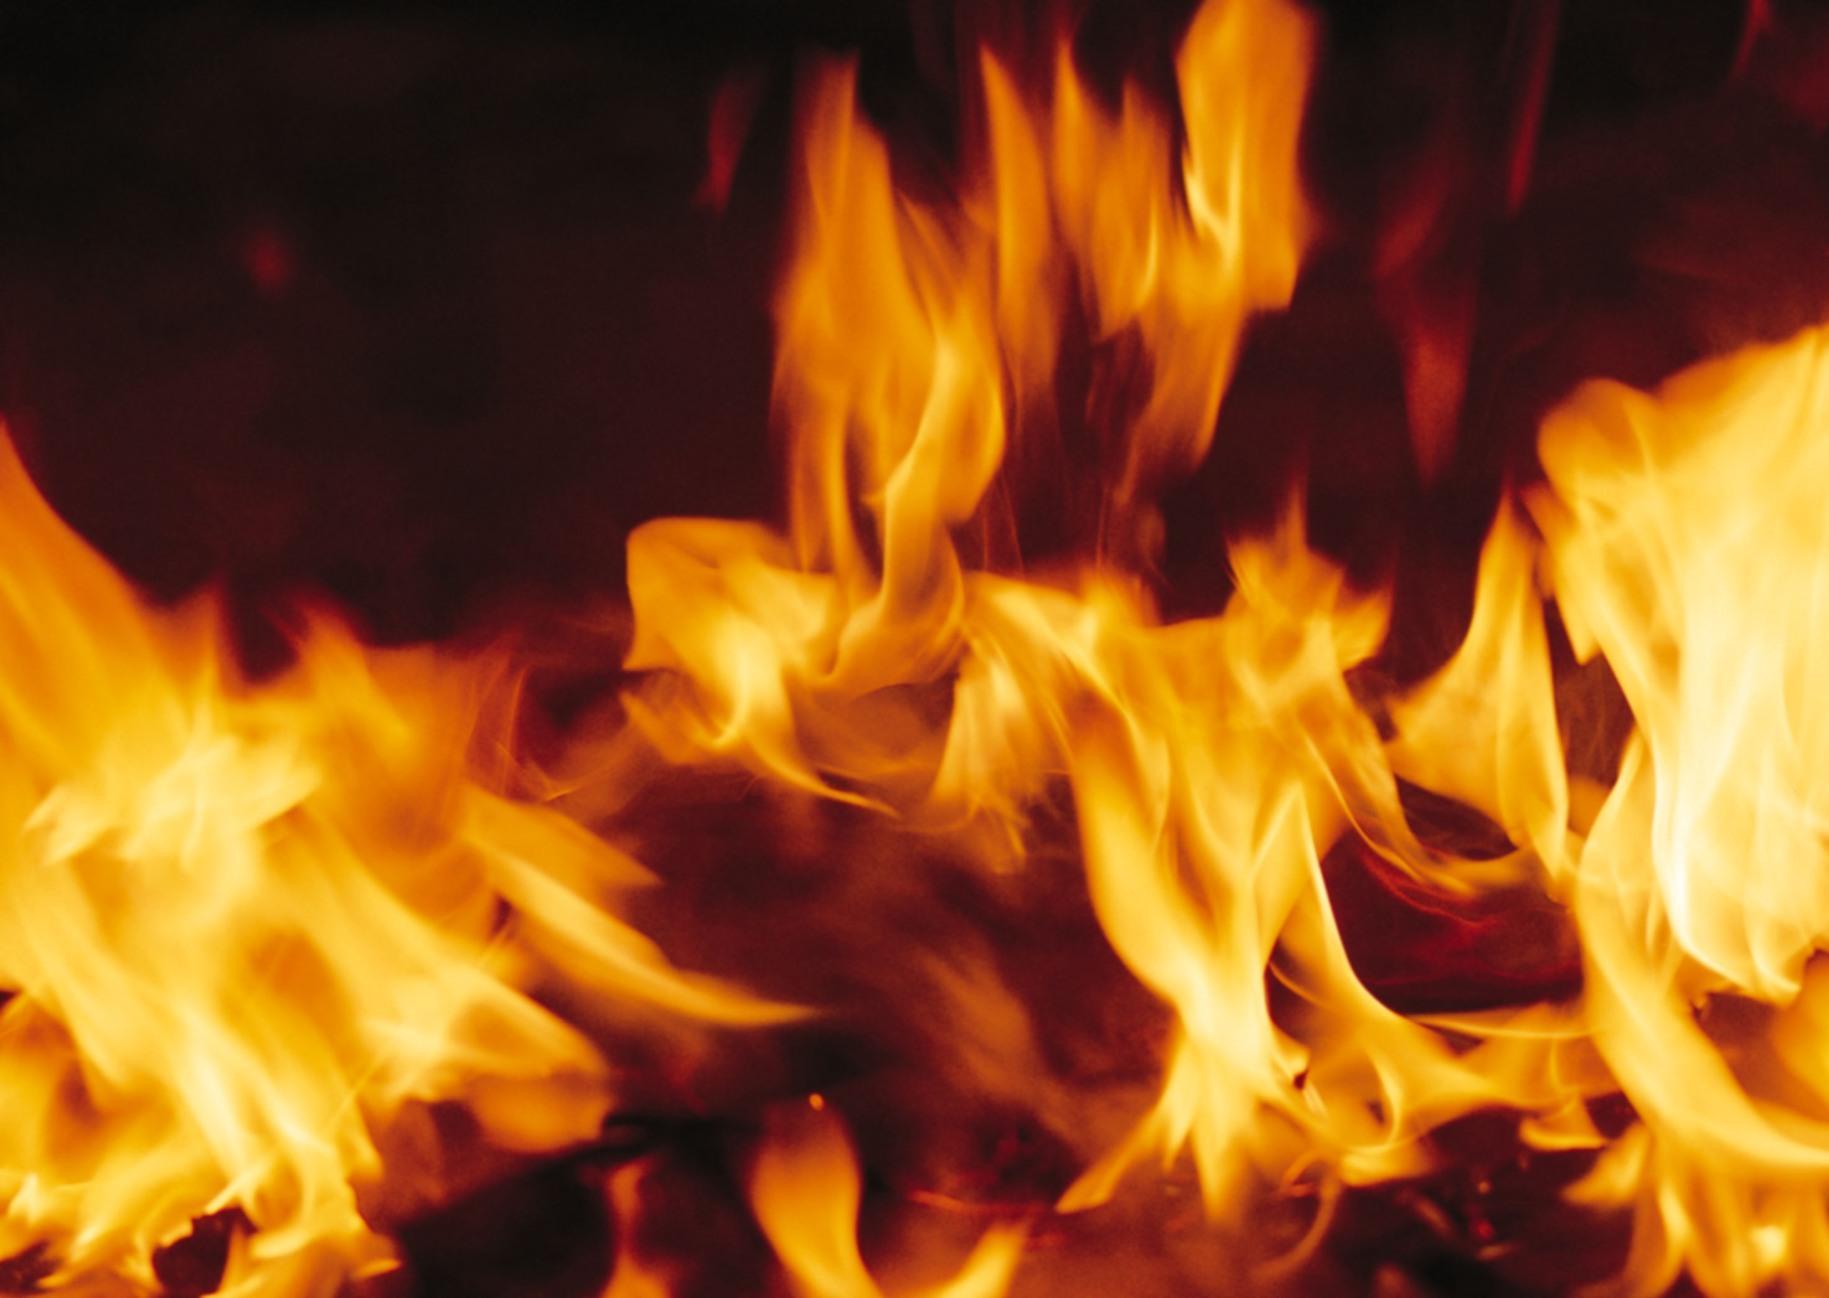 48 Animated Fire Desktop Wallpaper On Wallpapersafari